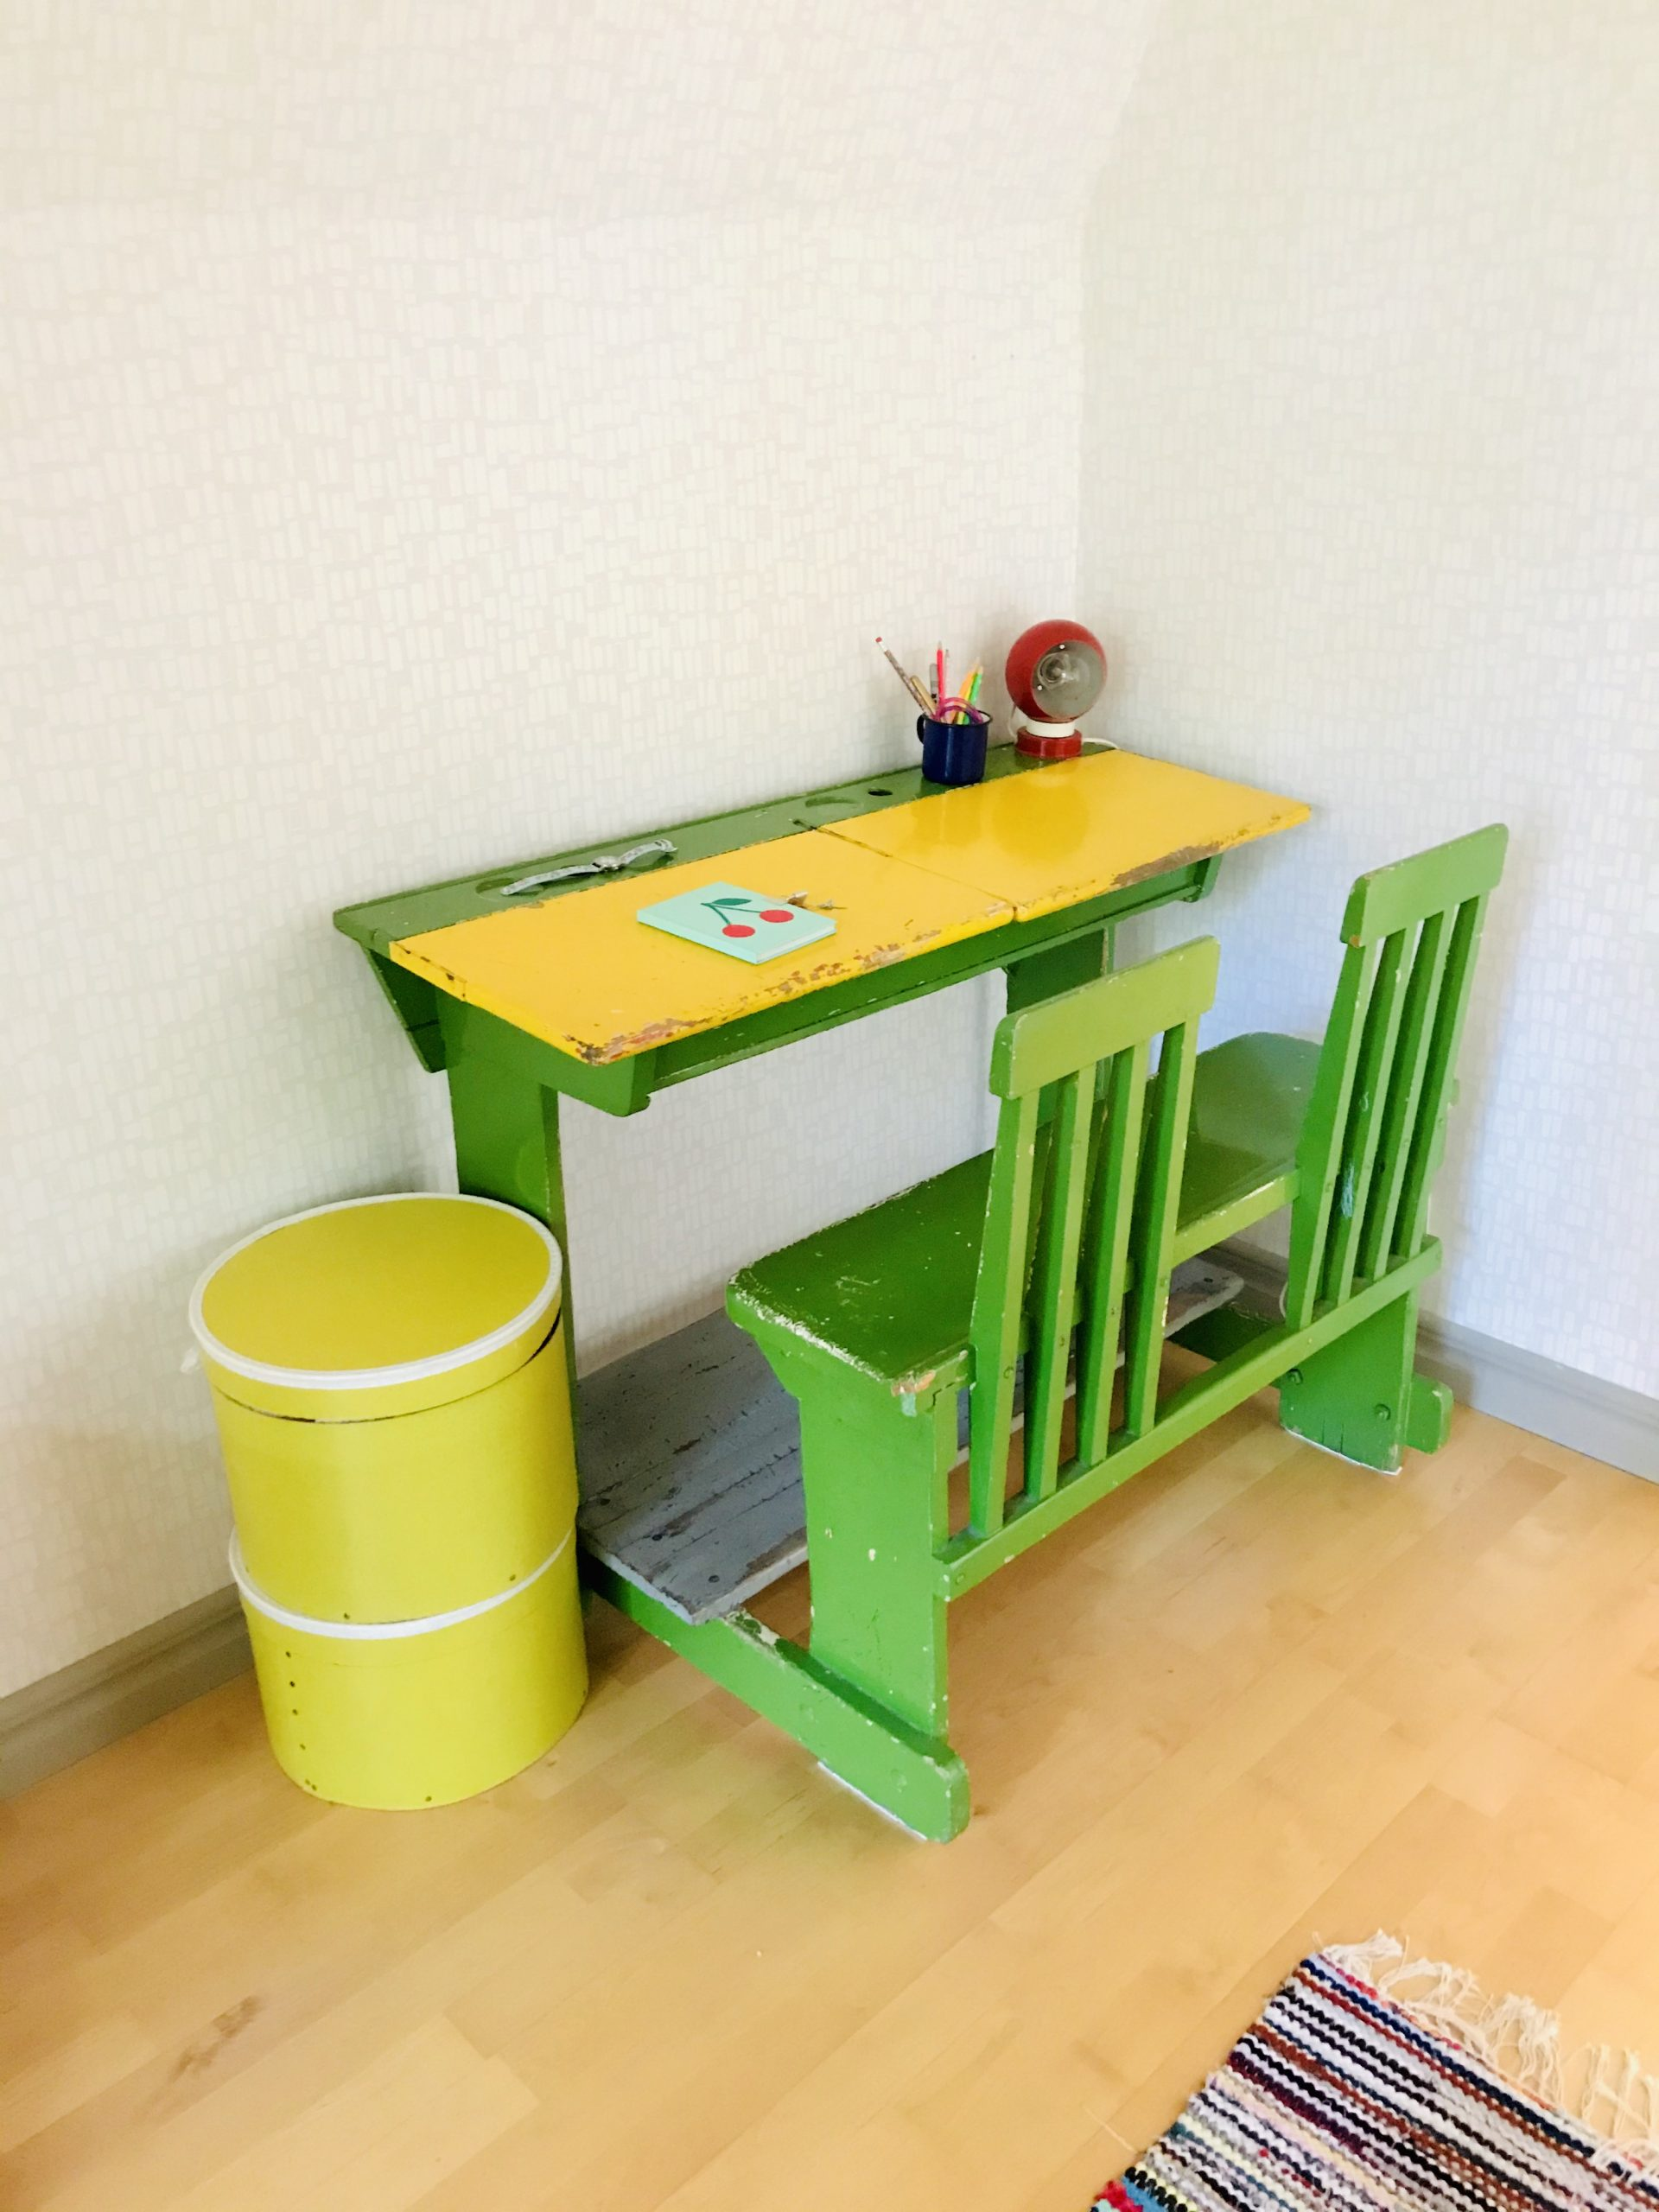 Elluyellow värikäs retro pulpetti vintage lastenhuoneessa